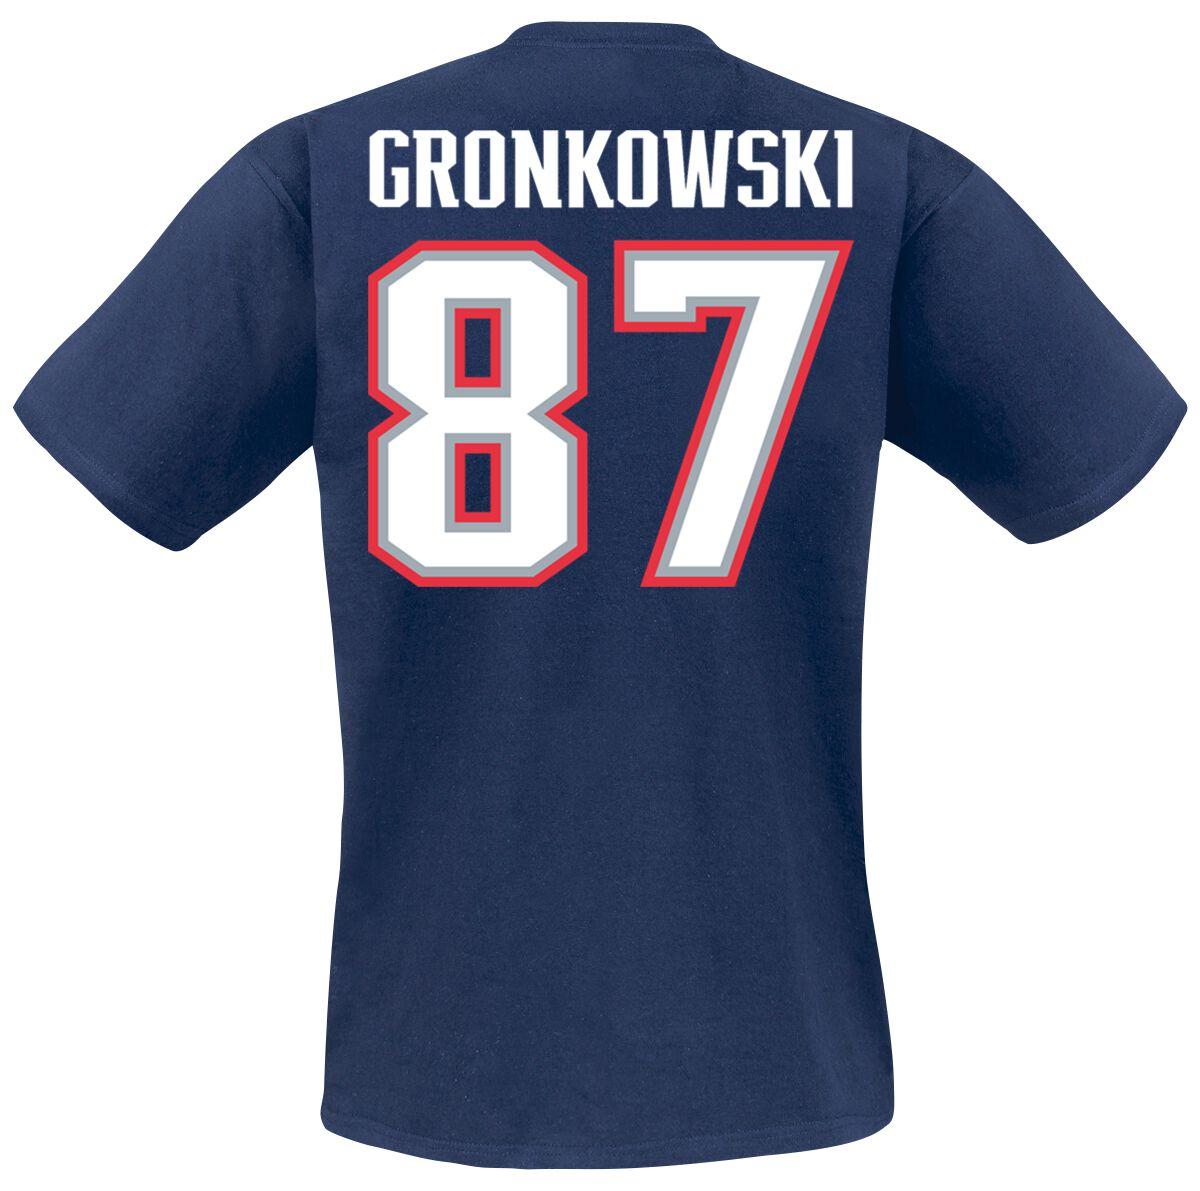 new concept 863e5 1c408 New England Patriots Gronkowski #87